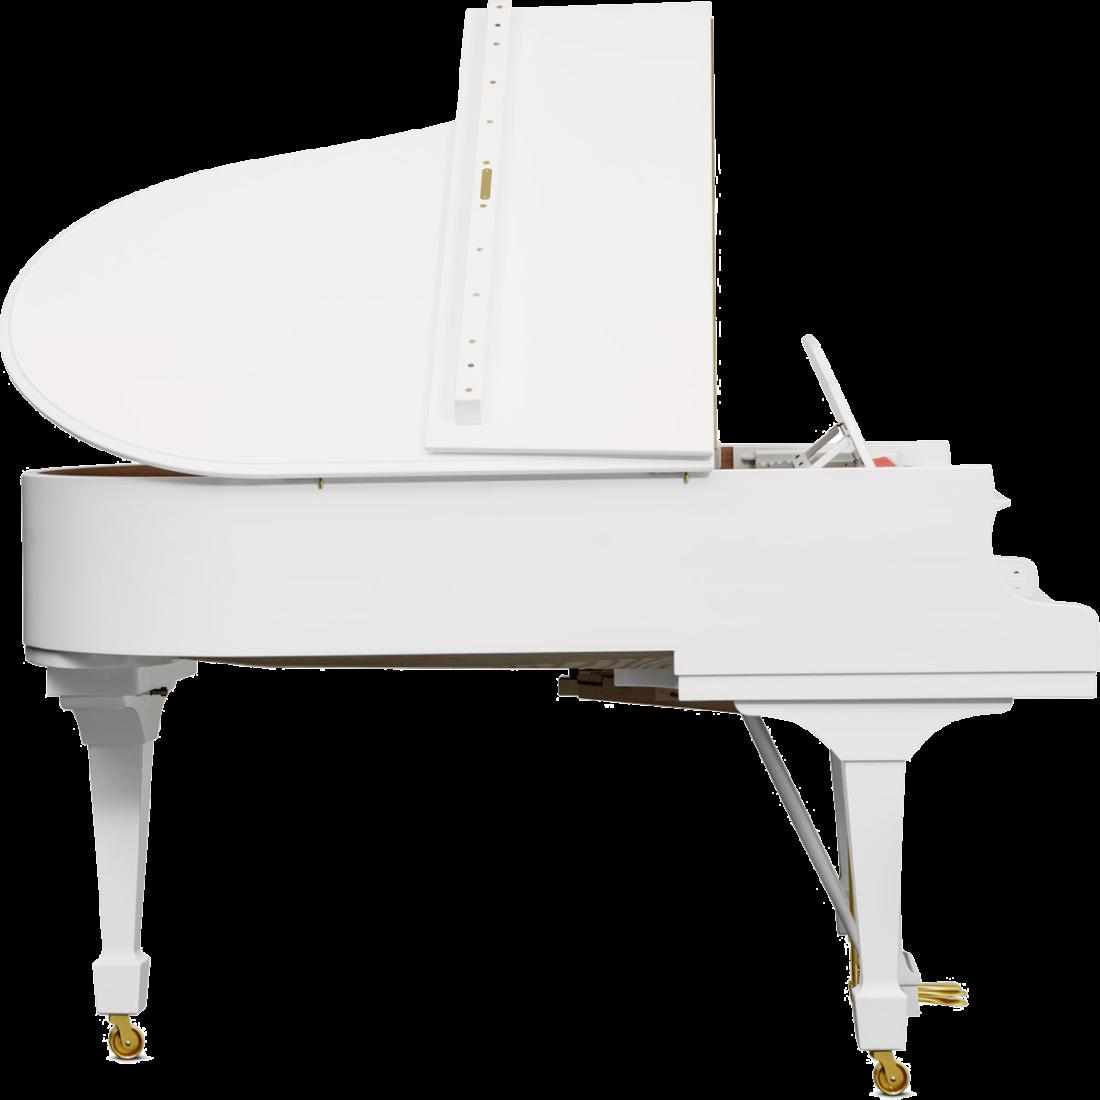 piano-cola-steinway-sons-o180-spirio-artesanal-nuevo-blanco-lateral-02